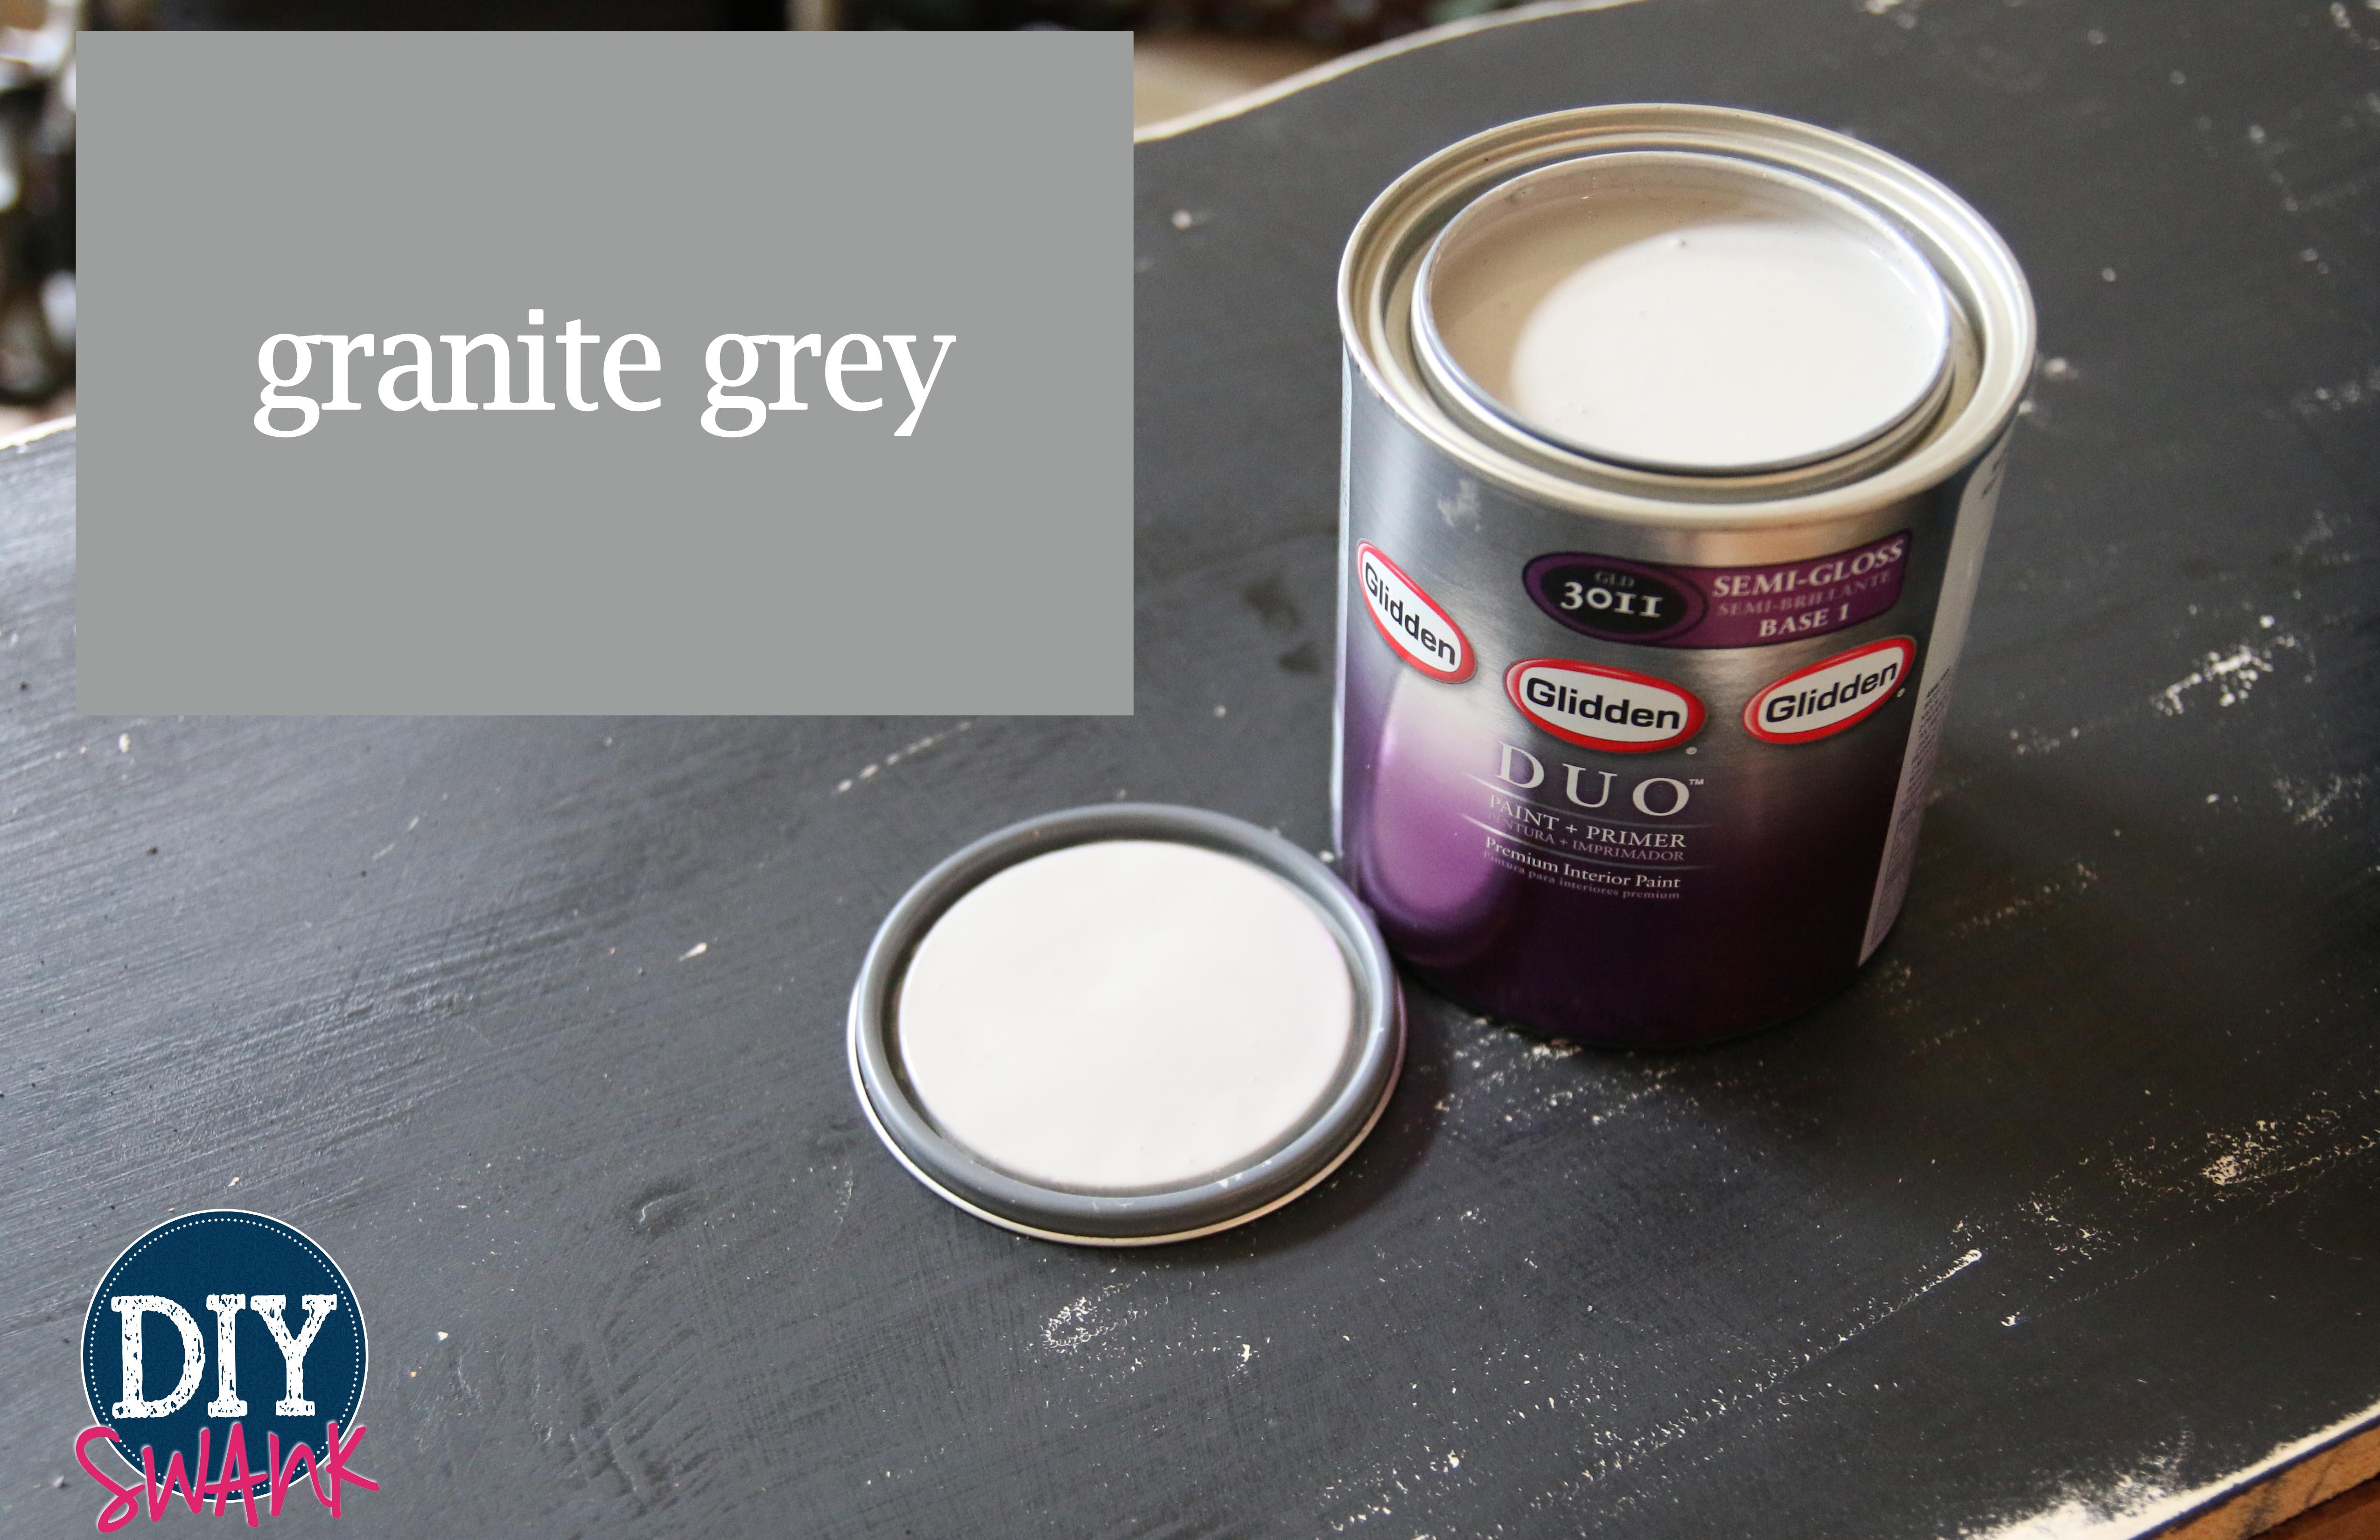 Glidden Granite Gray Paint